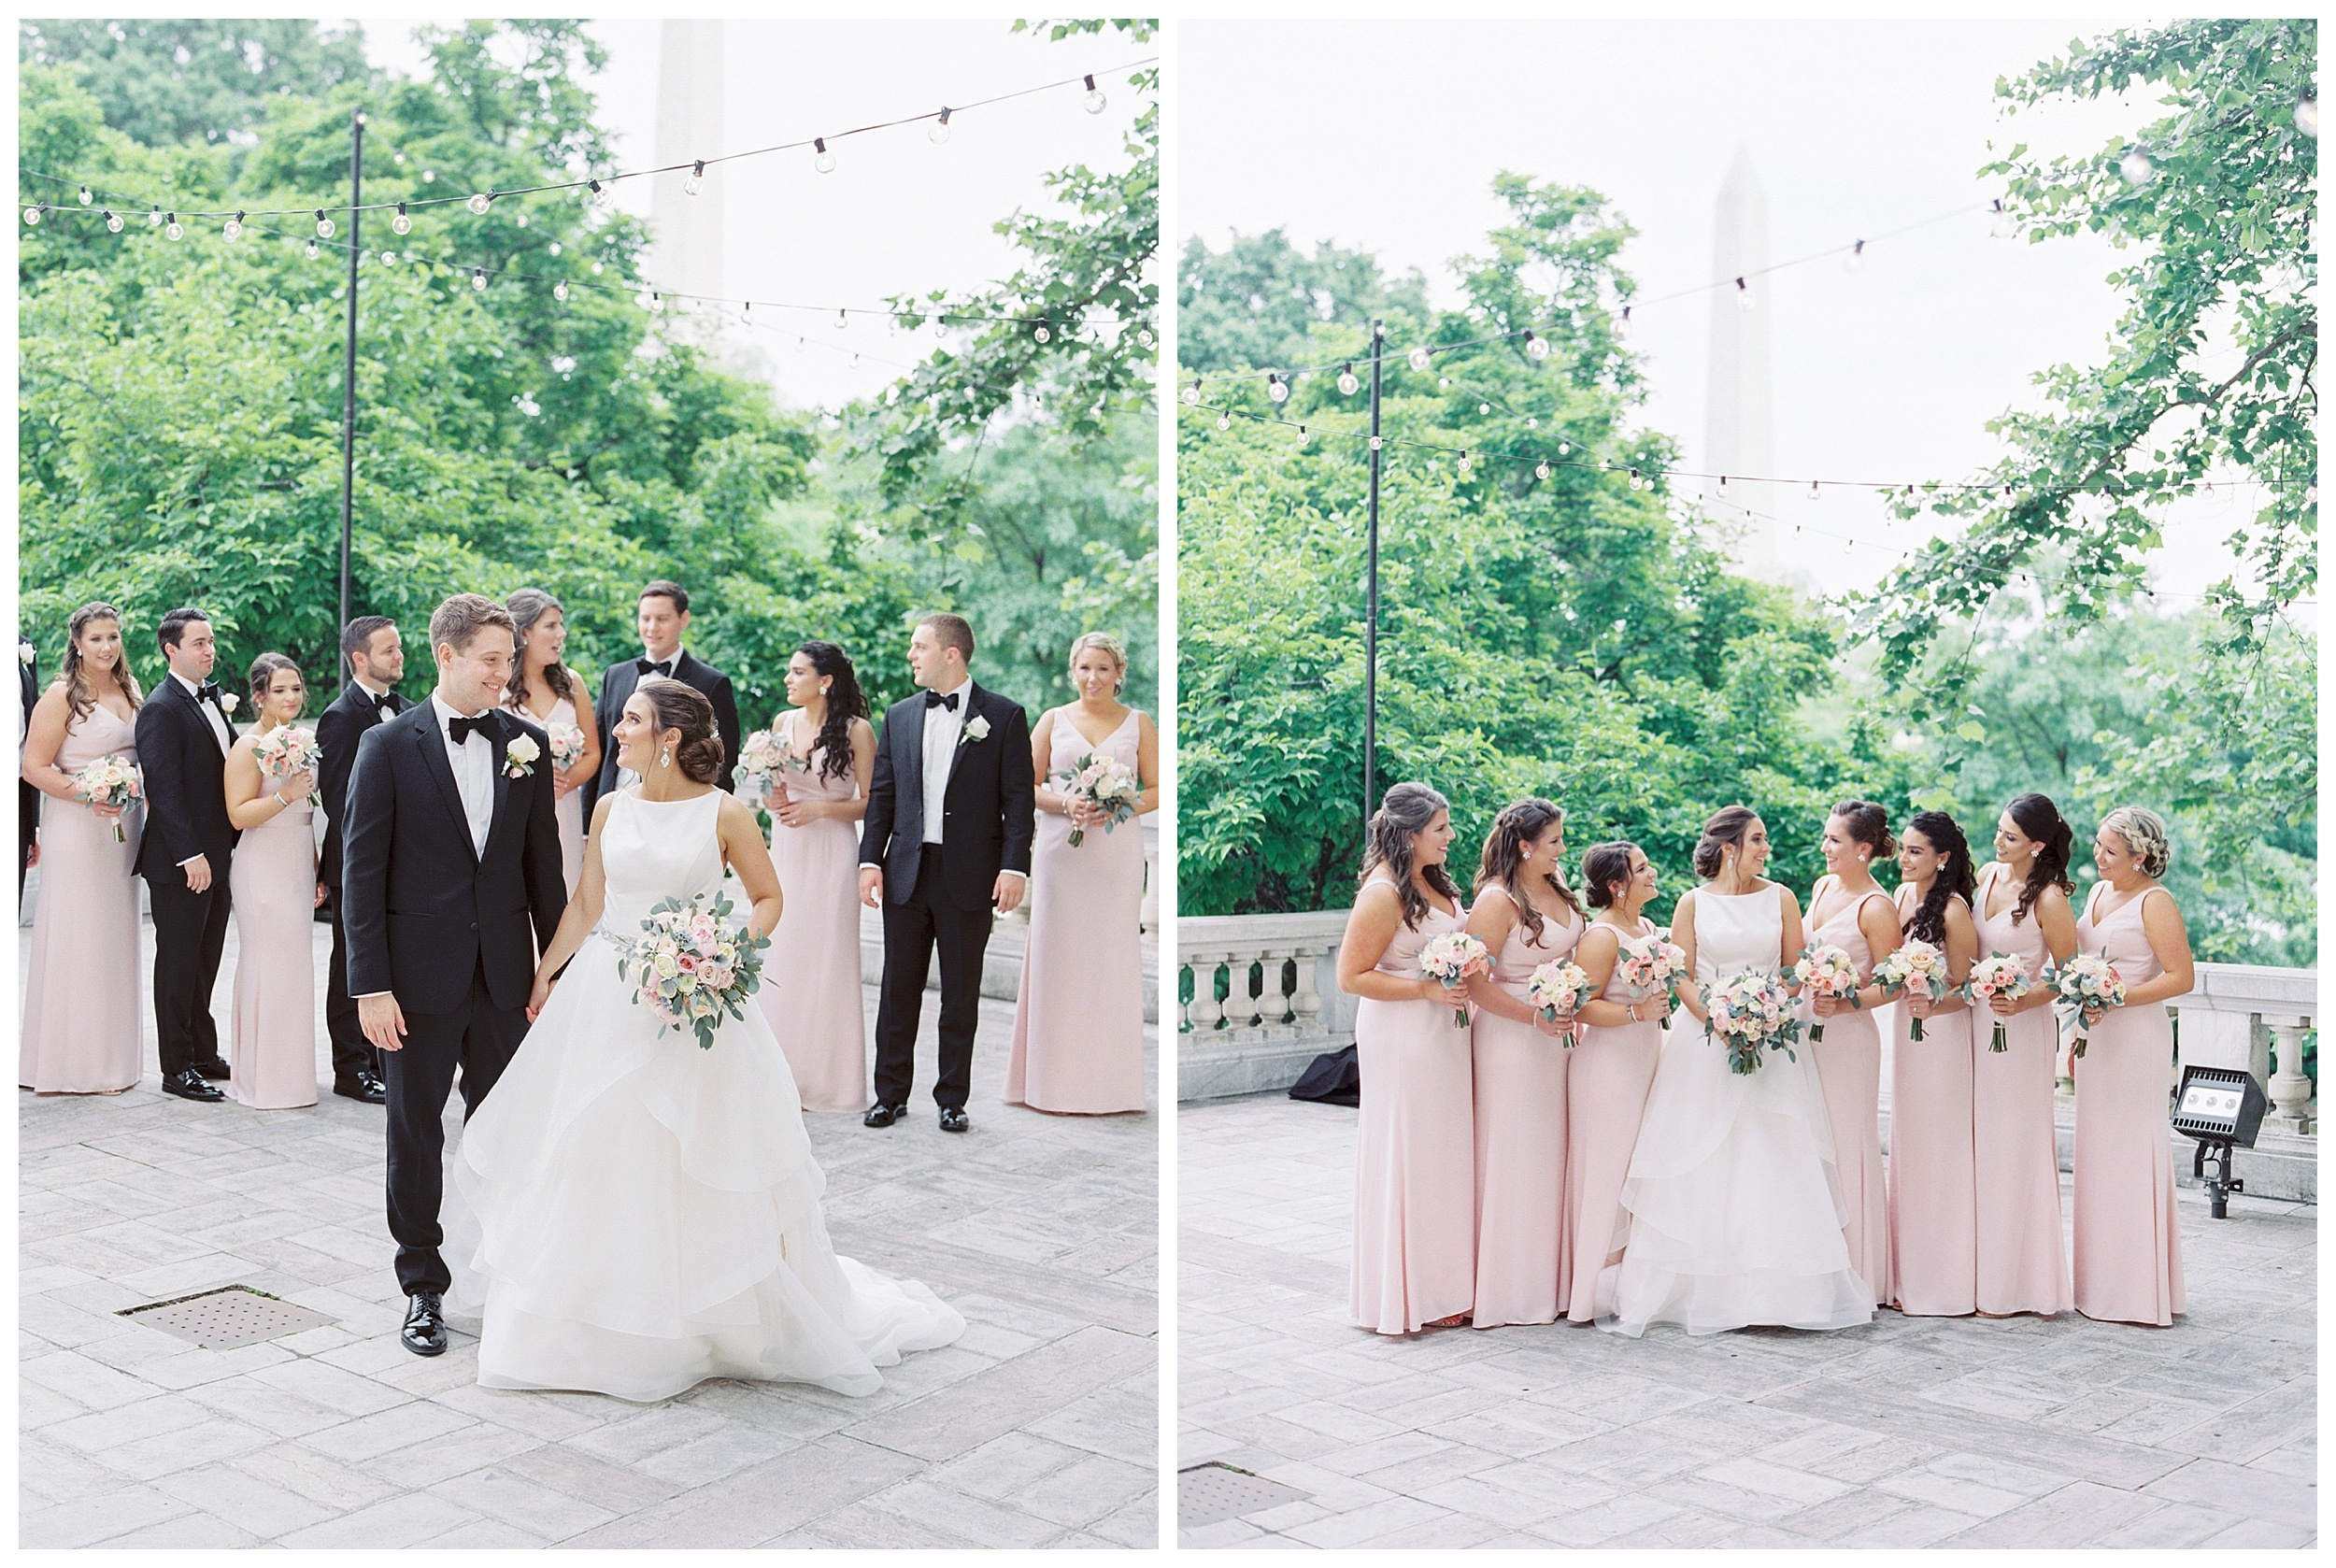 DAR Constitution Hall Wedding Wedding | Daughters of the American Revolution Wedding | District of Columbia Film Wedding Photographer Kir Tuben_0088.jpg